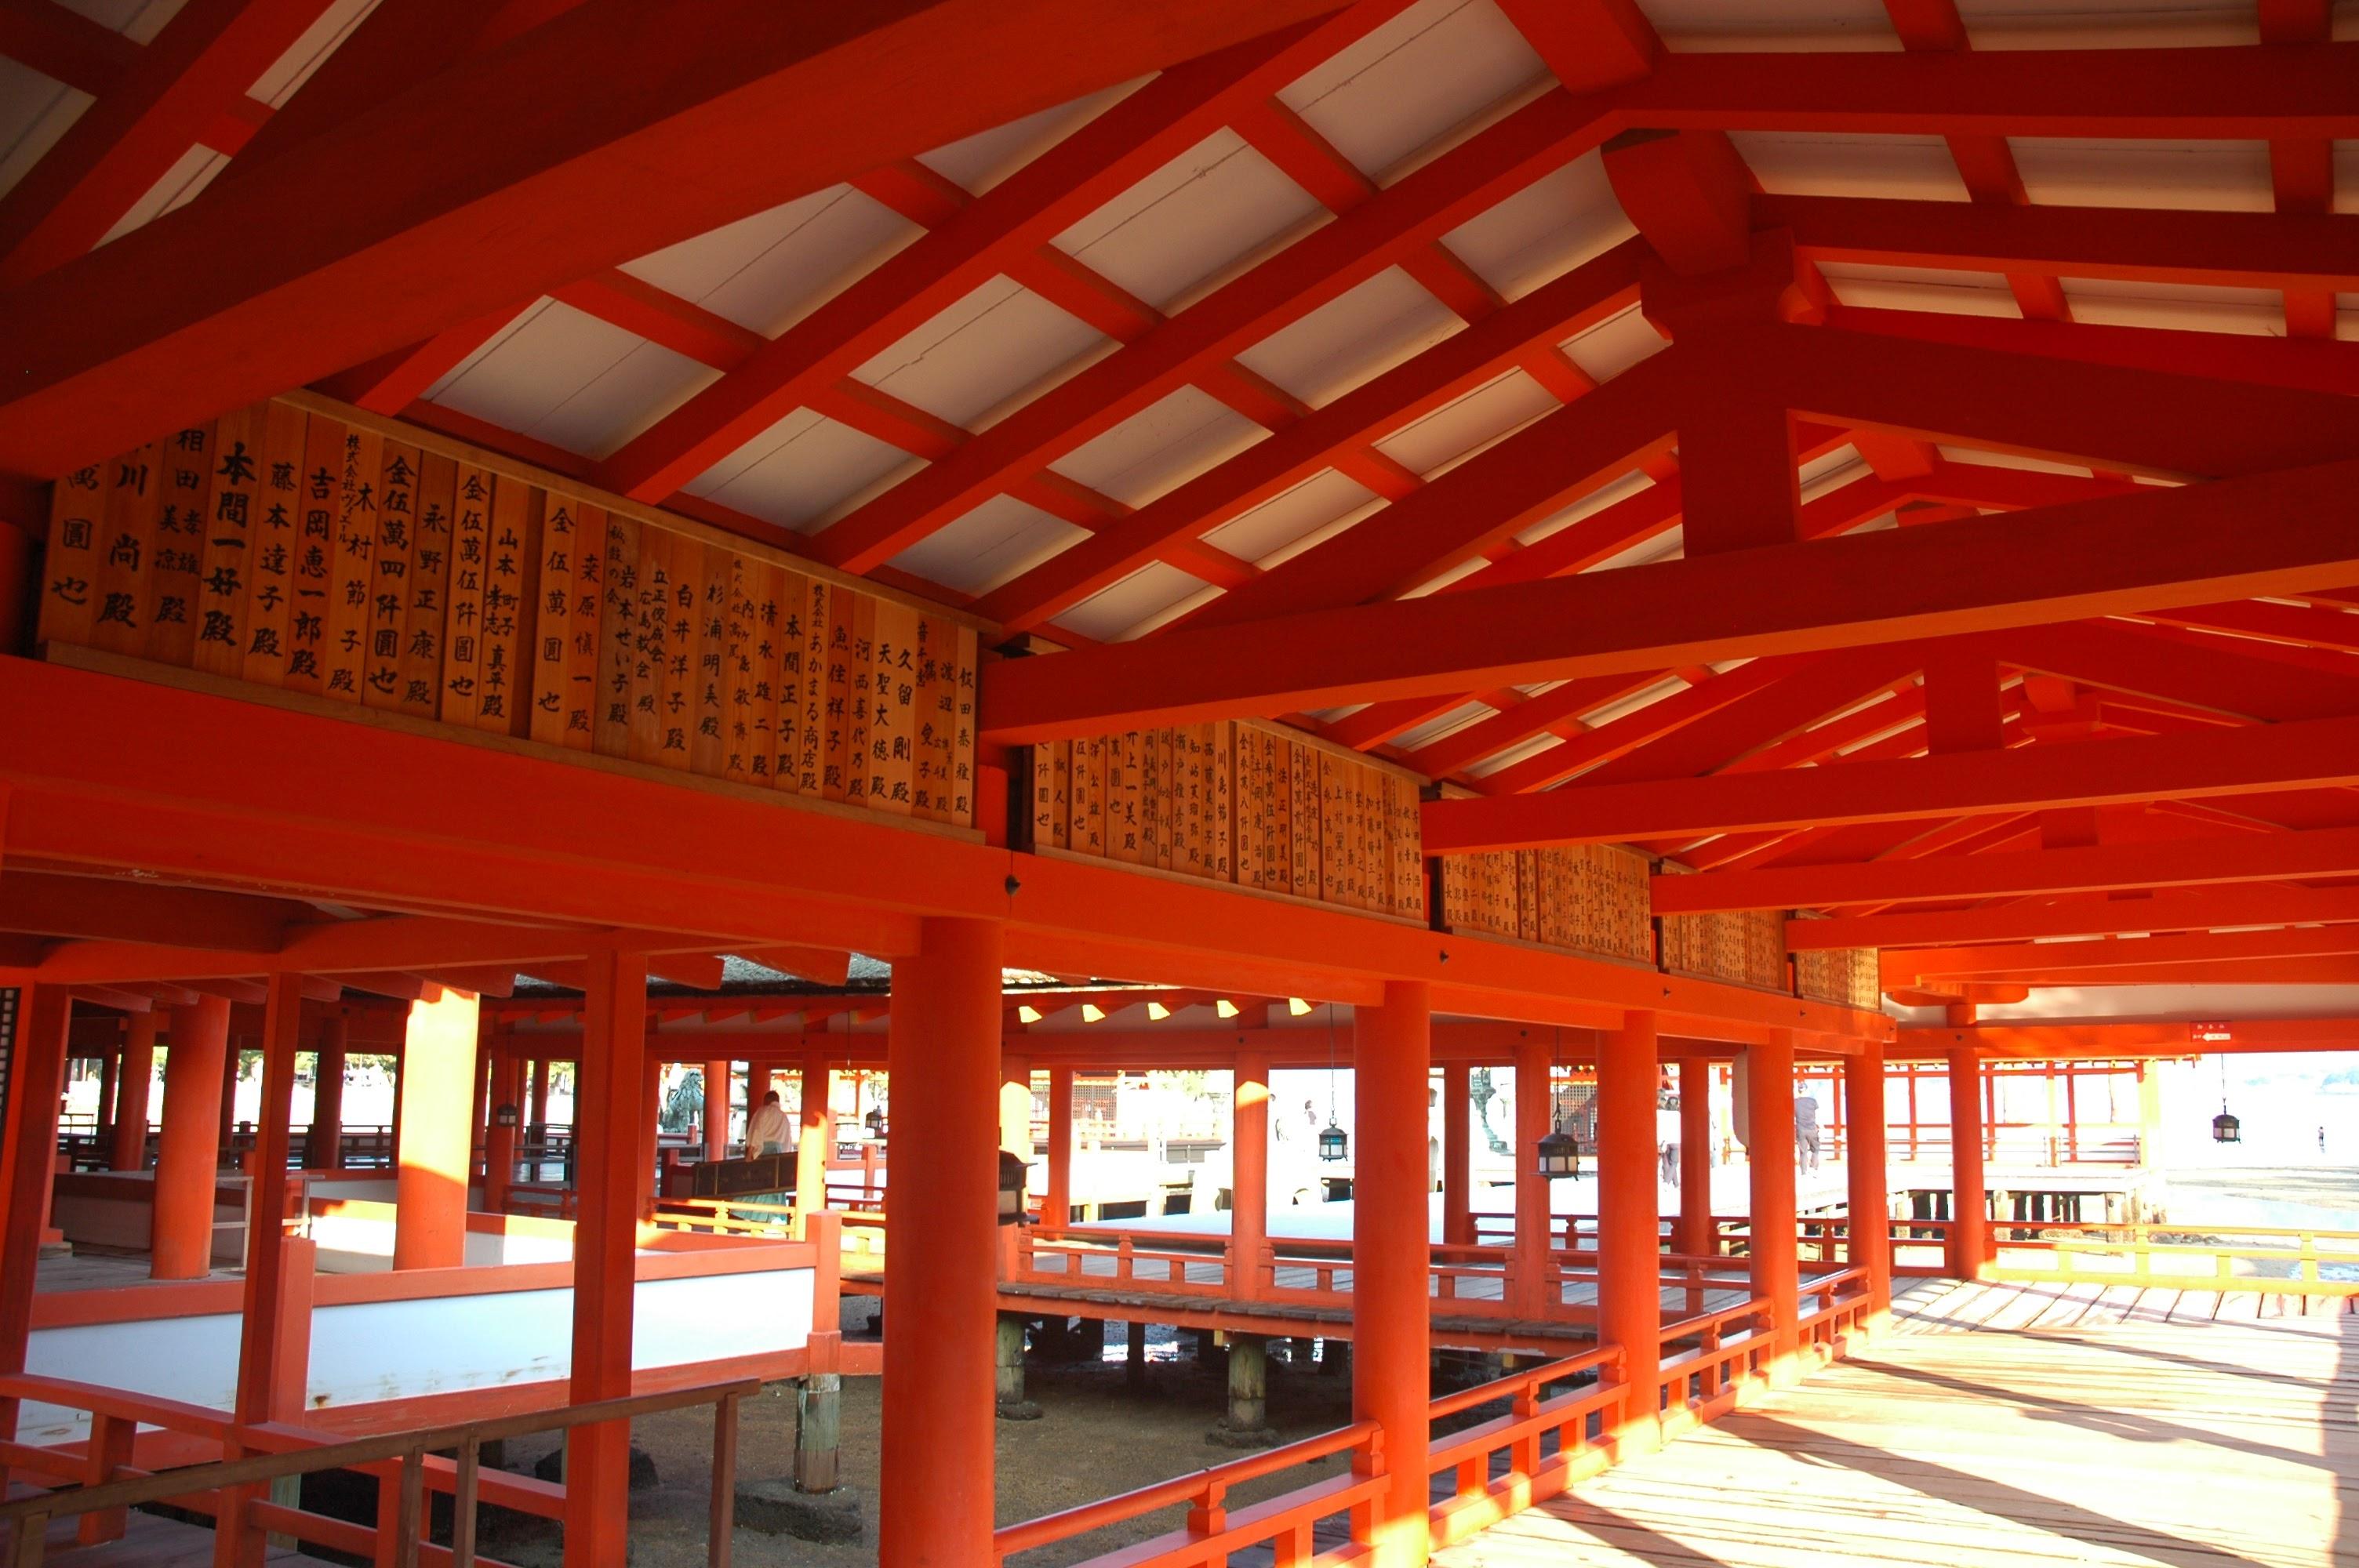 Shrine corridors